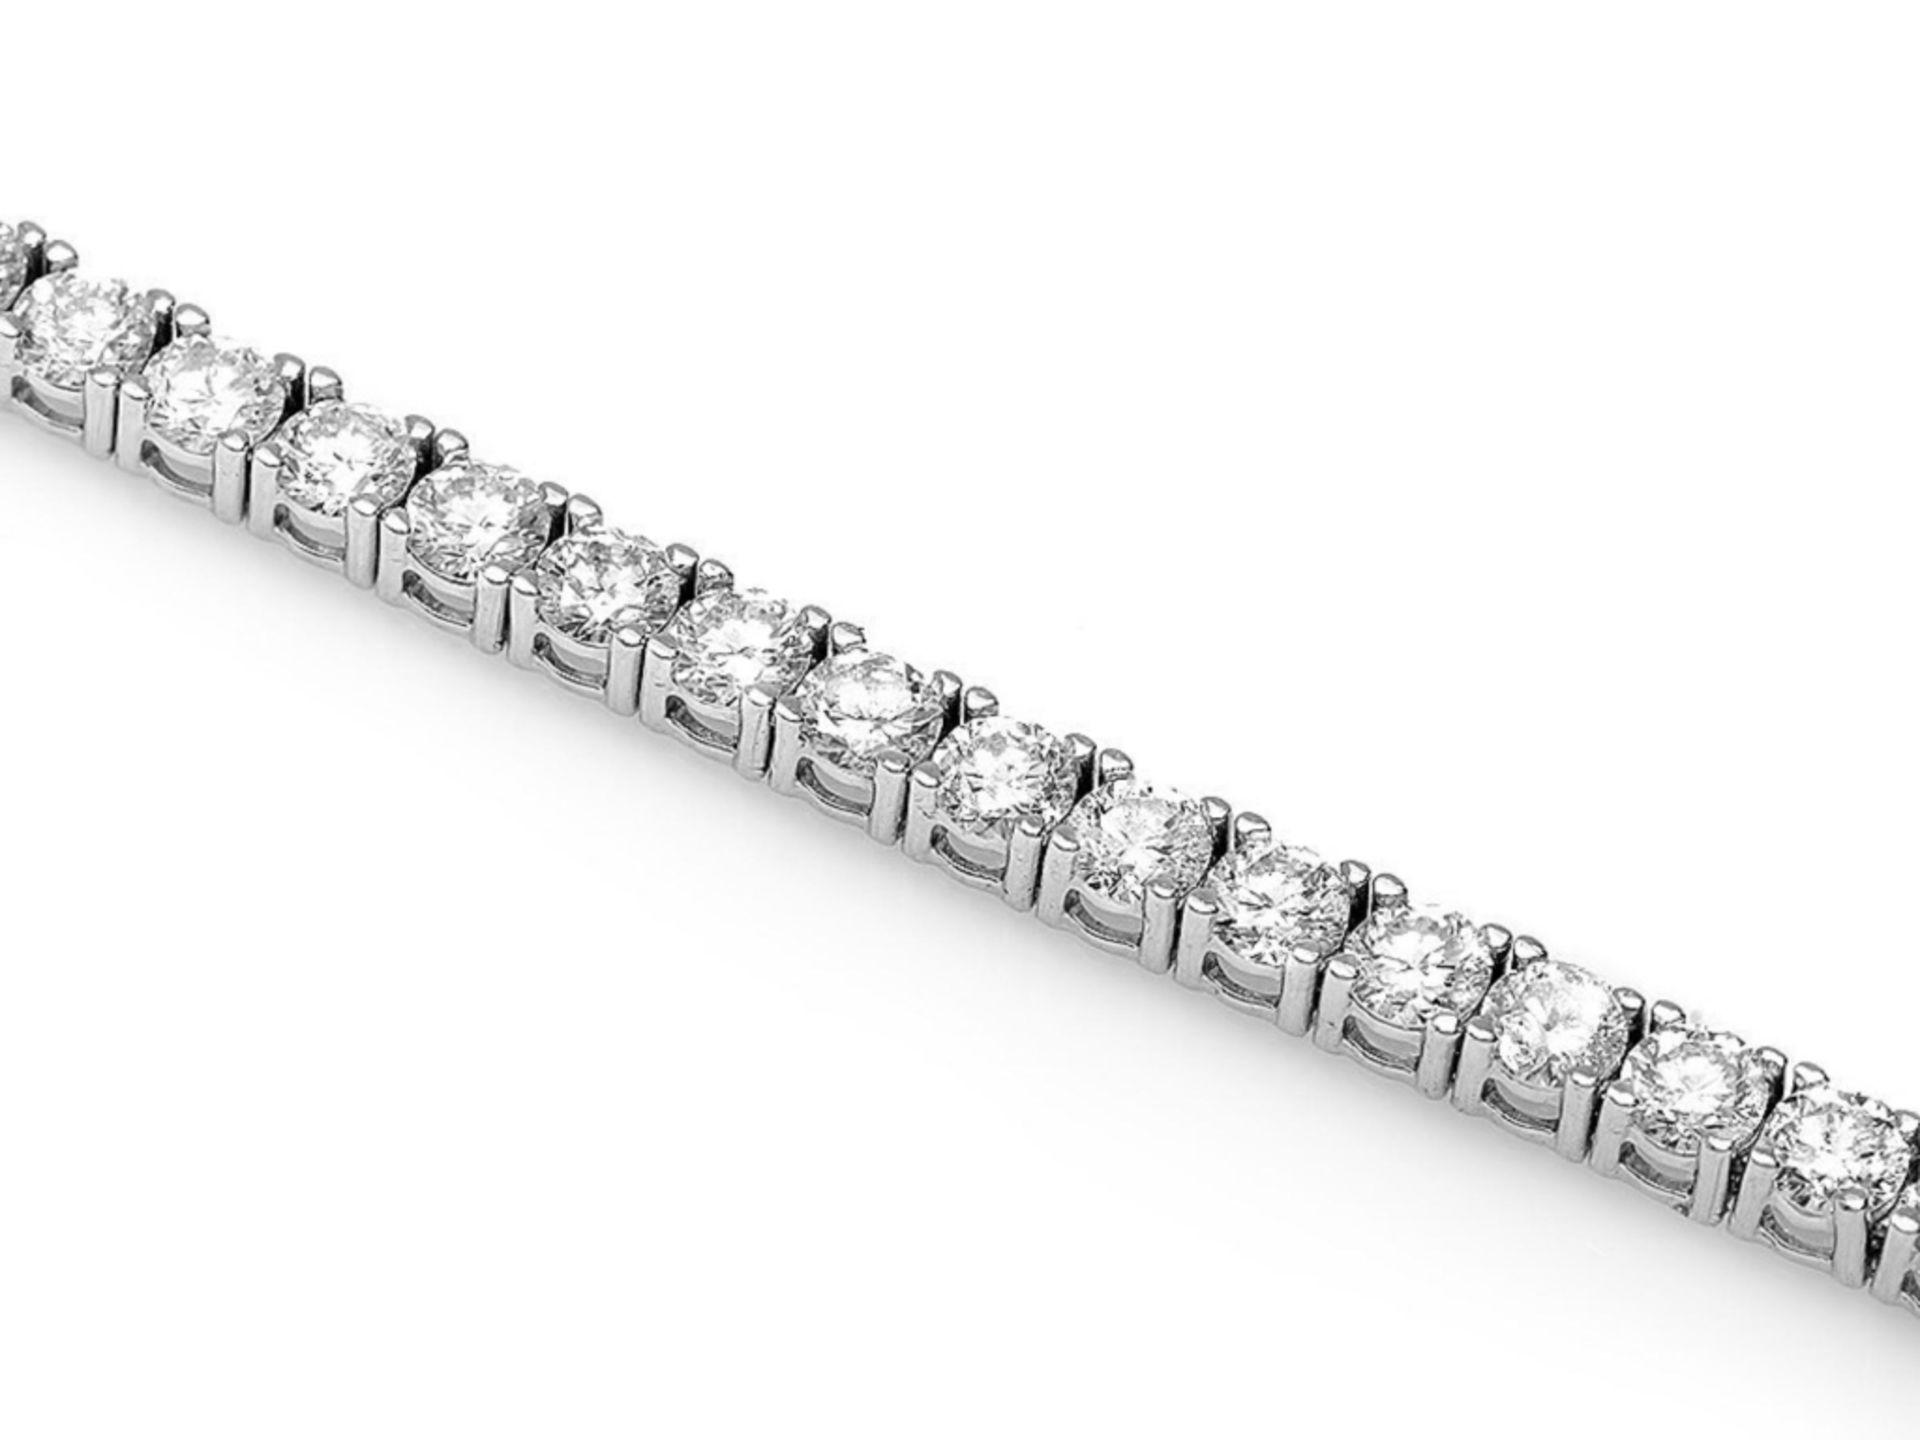 ^18k White Gold 5.00ct Diamond Bracelet - Image 2 of 4